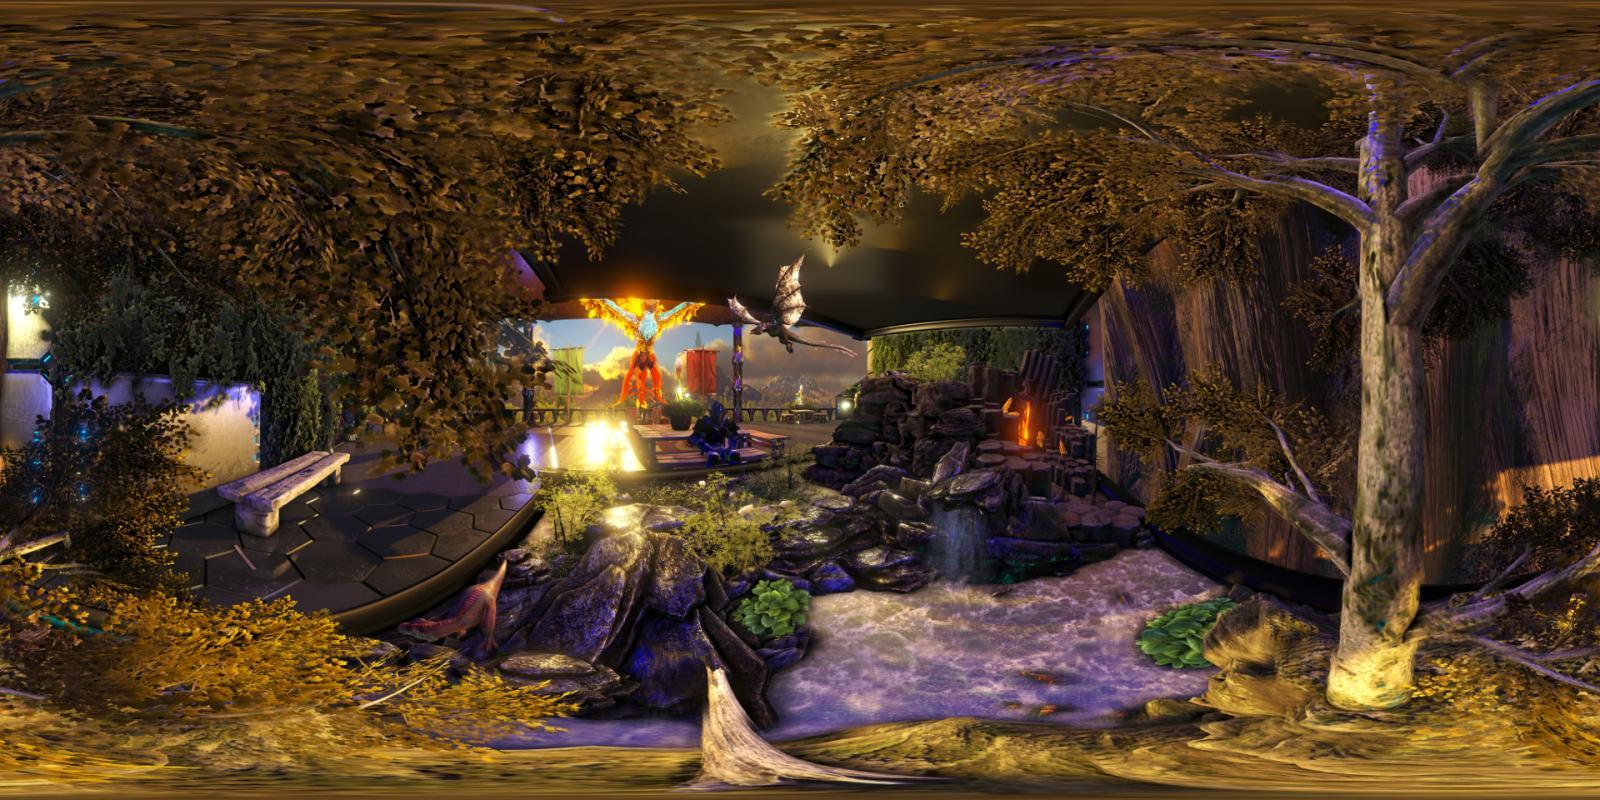 large.5a62baa847673_Vakarian-LittleWorld-Panoramic360Steroscopic3D.jpg